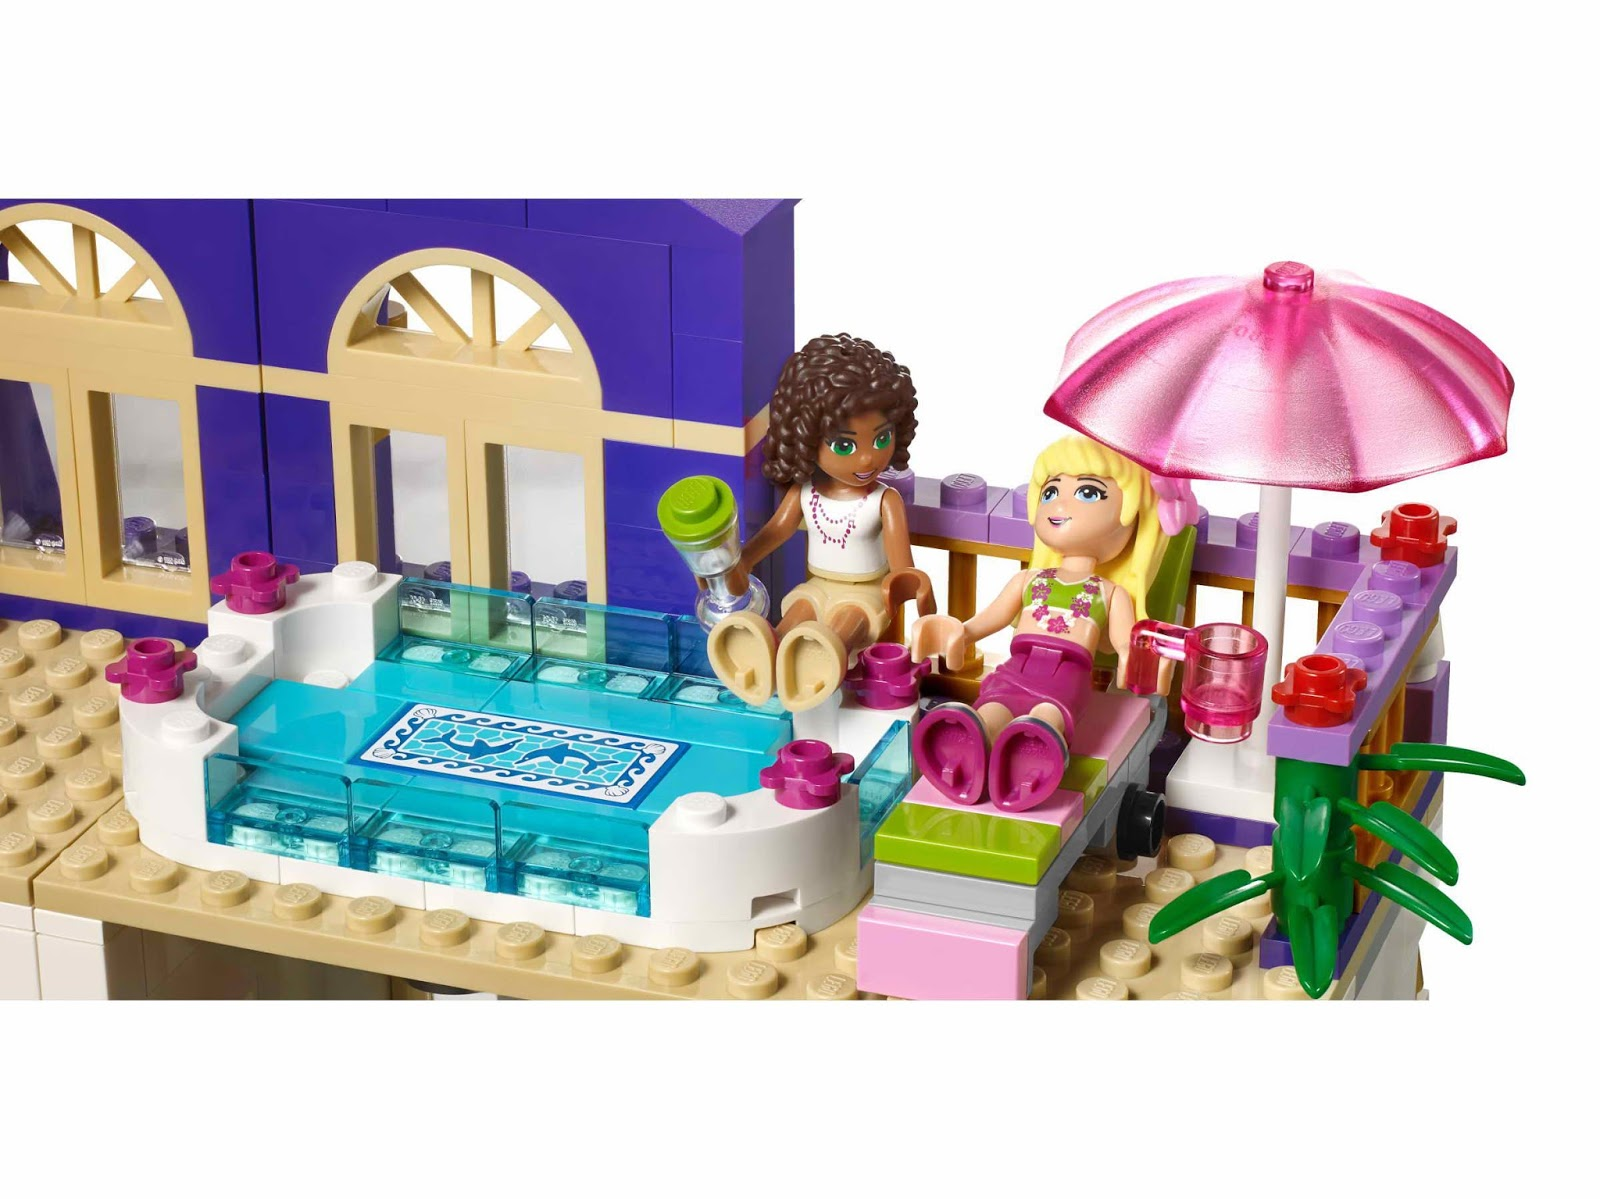 Brick Friends: LEGO 41101 Heartlake Grand Hotel